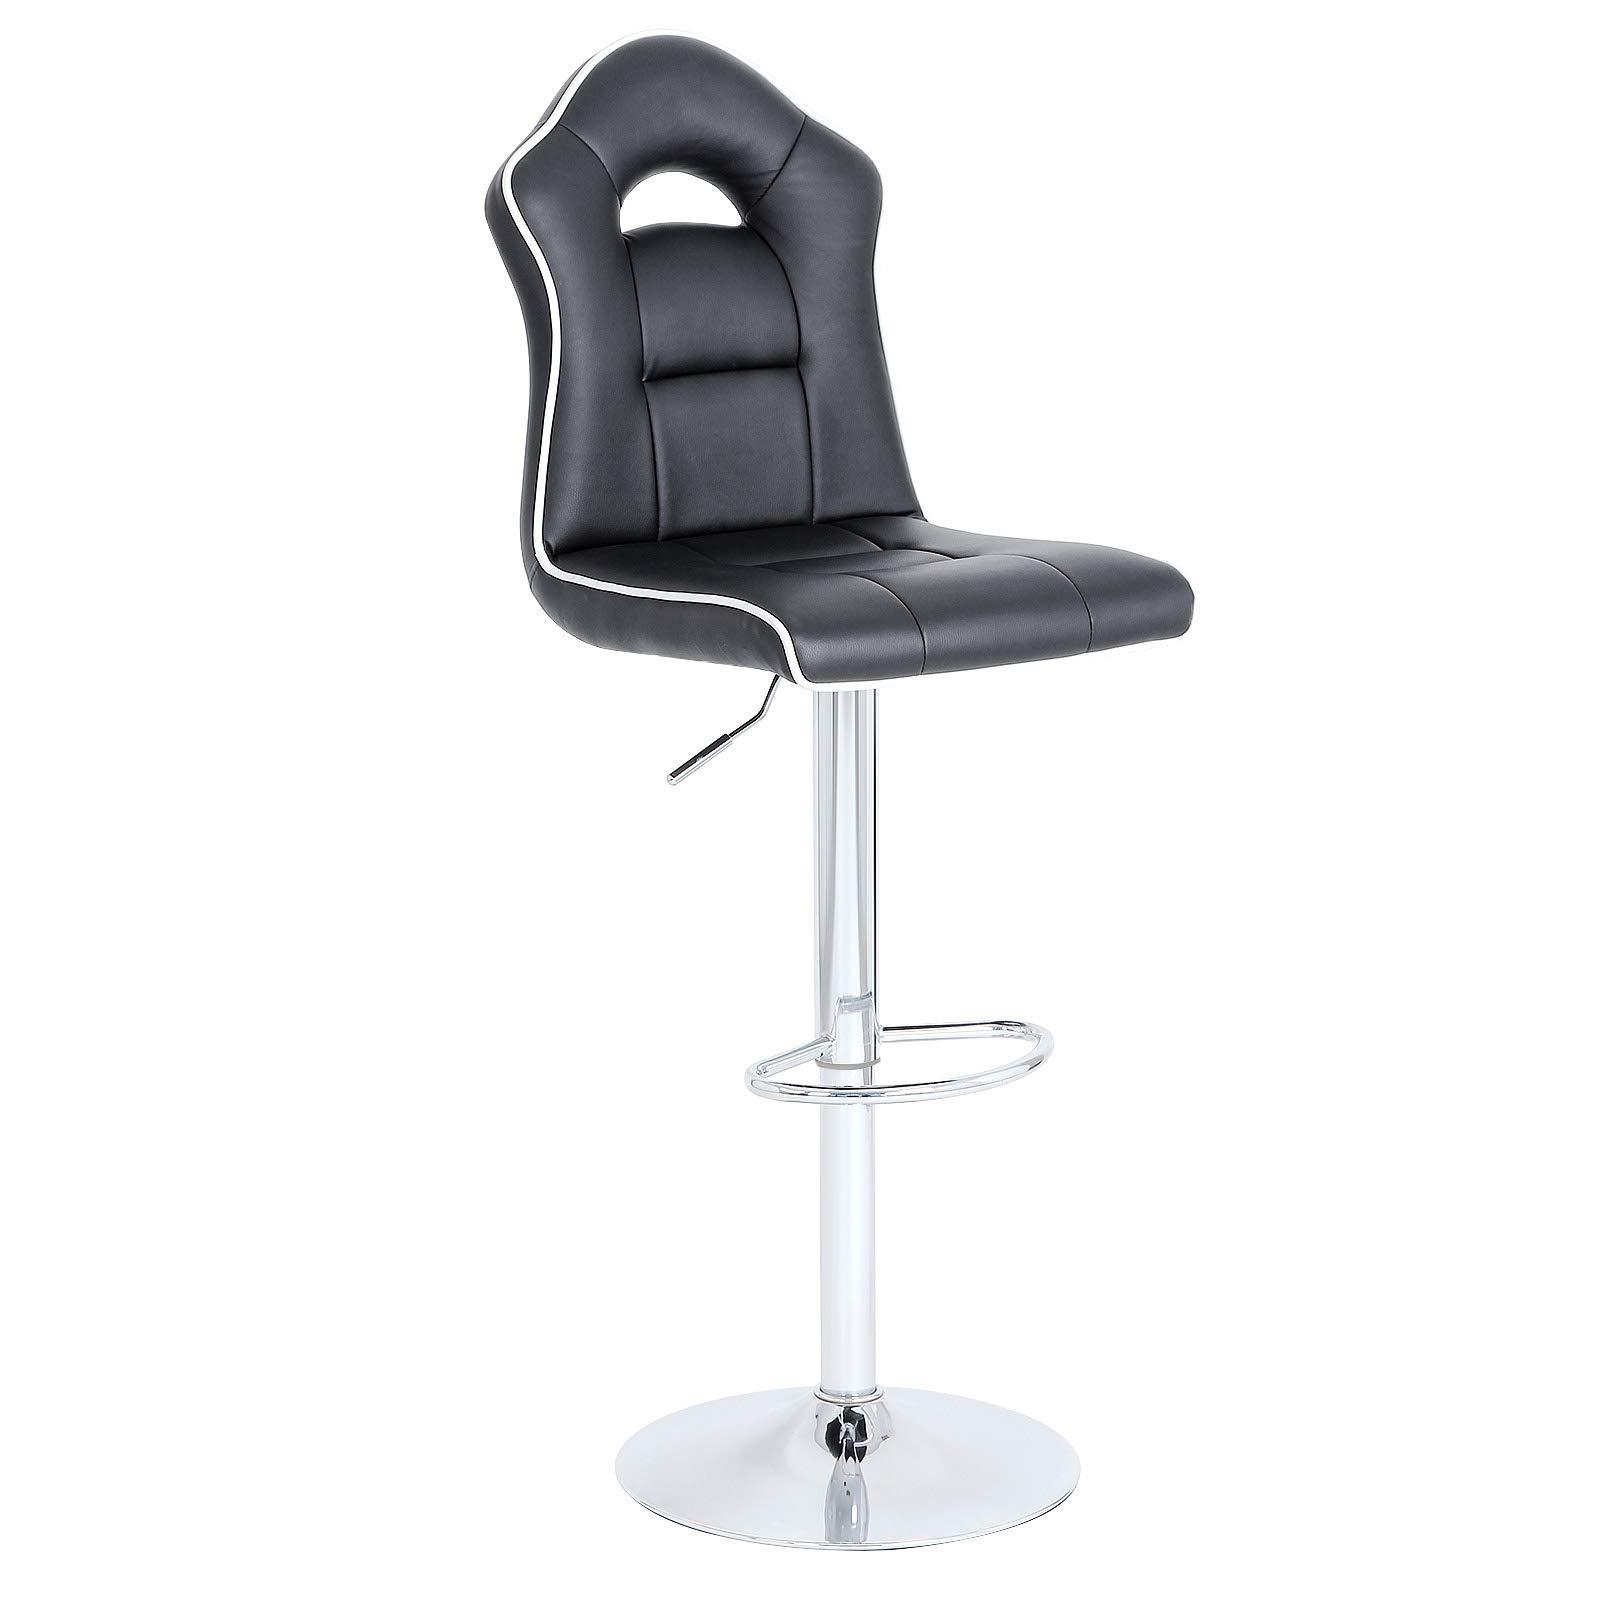 SONGMICS 10 Bar Stool, Adjustable Bar Chair, Adjustable Swivel Breakfast  Kitchen Stool with Footrest, Chrome-Plated Steel